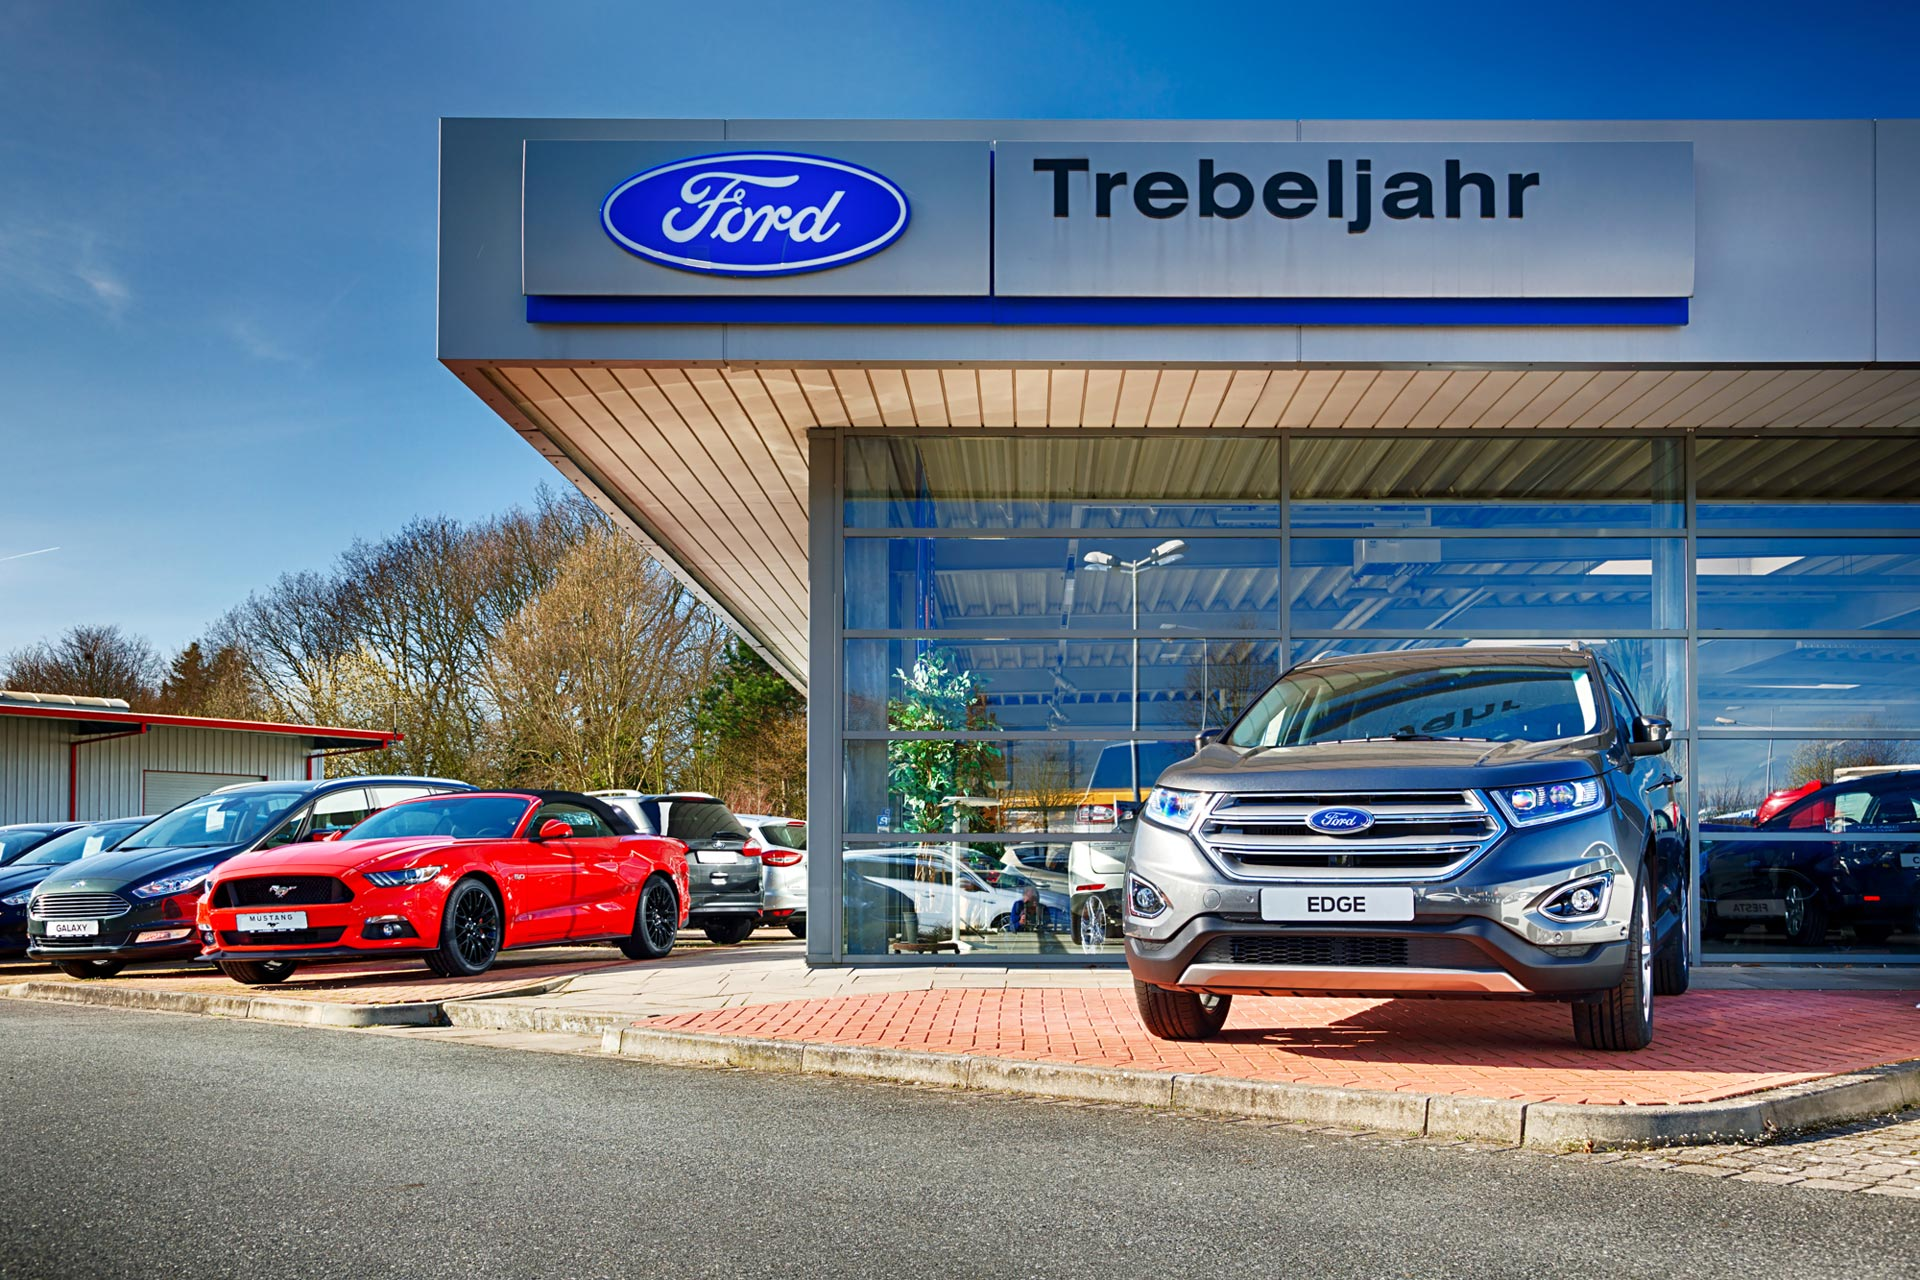 fiwi-referenzen-ford-trebeljahr FiWi Consult - Premium Referenz - Ford Autohaus Trebeljahr